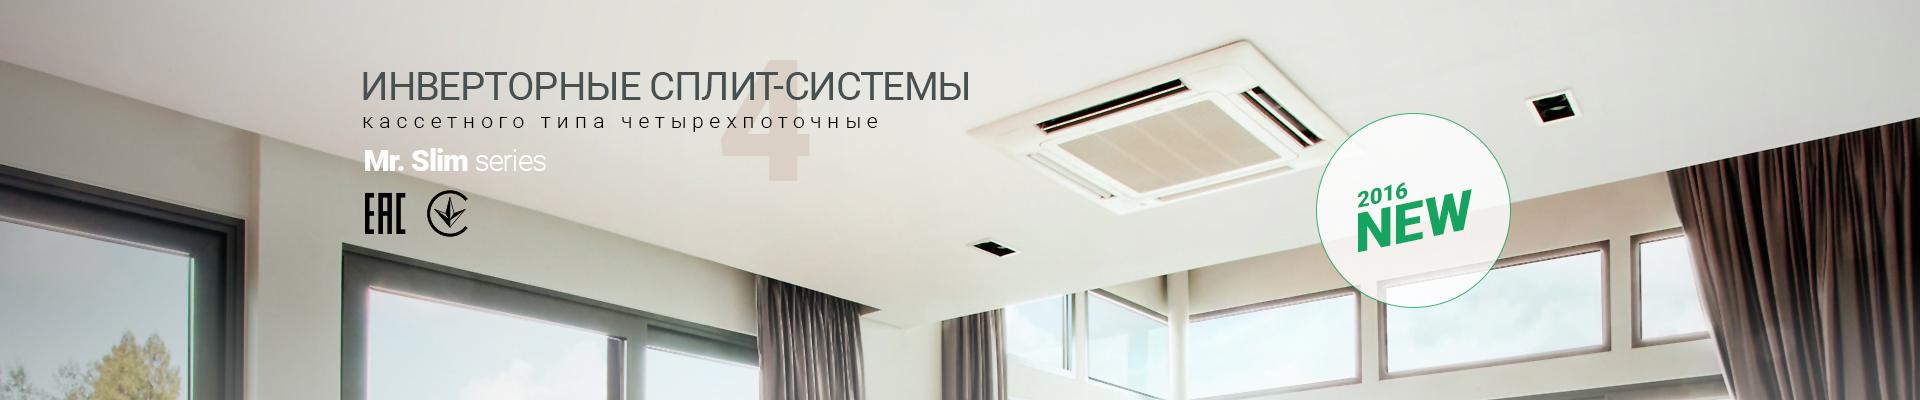 mitsubishi-electric-slz-kf_va_new2016.jpg